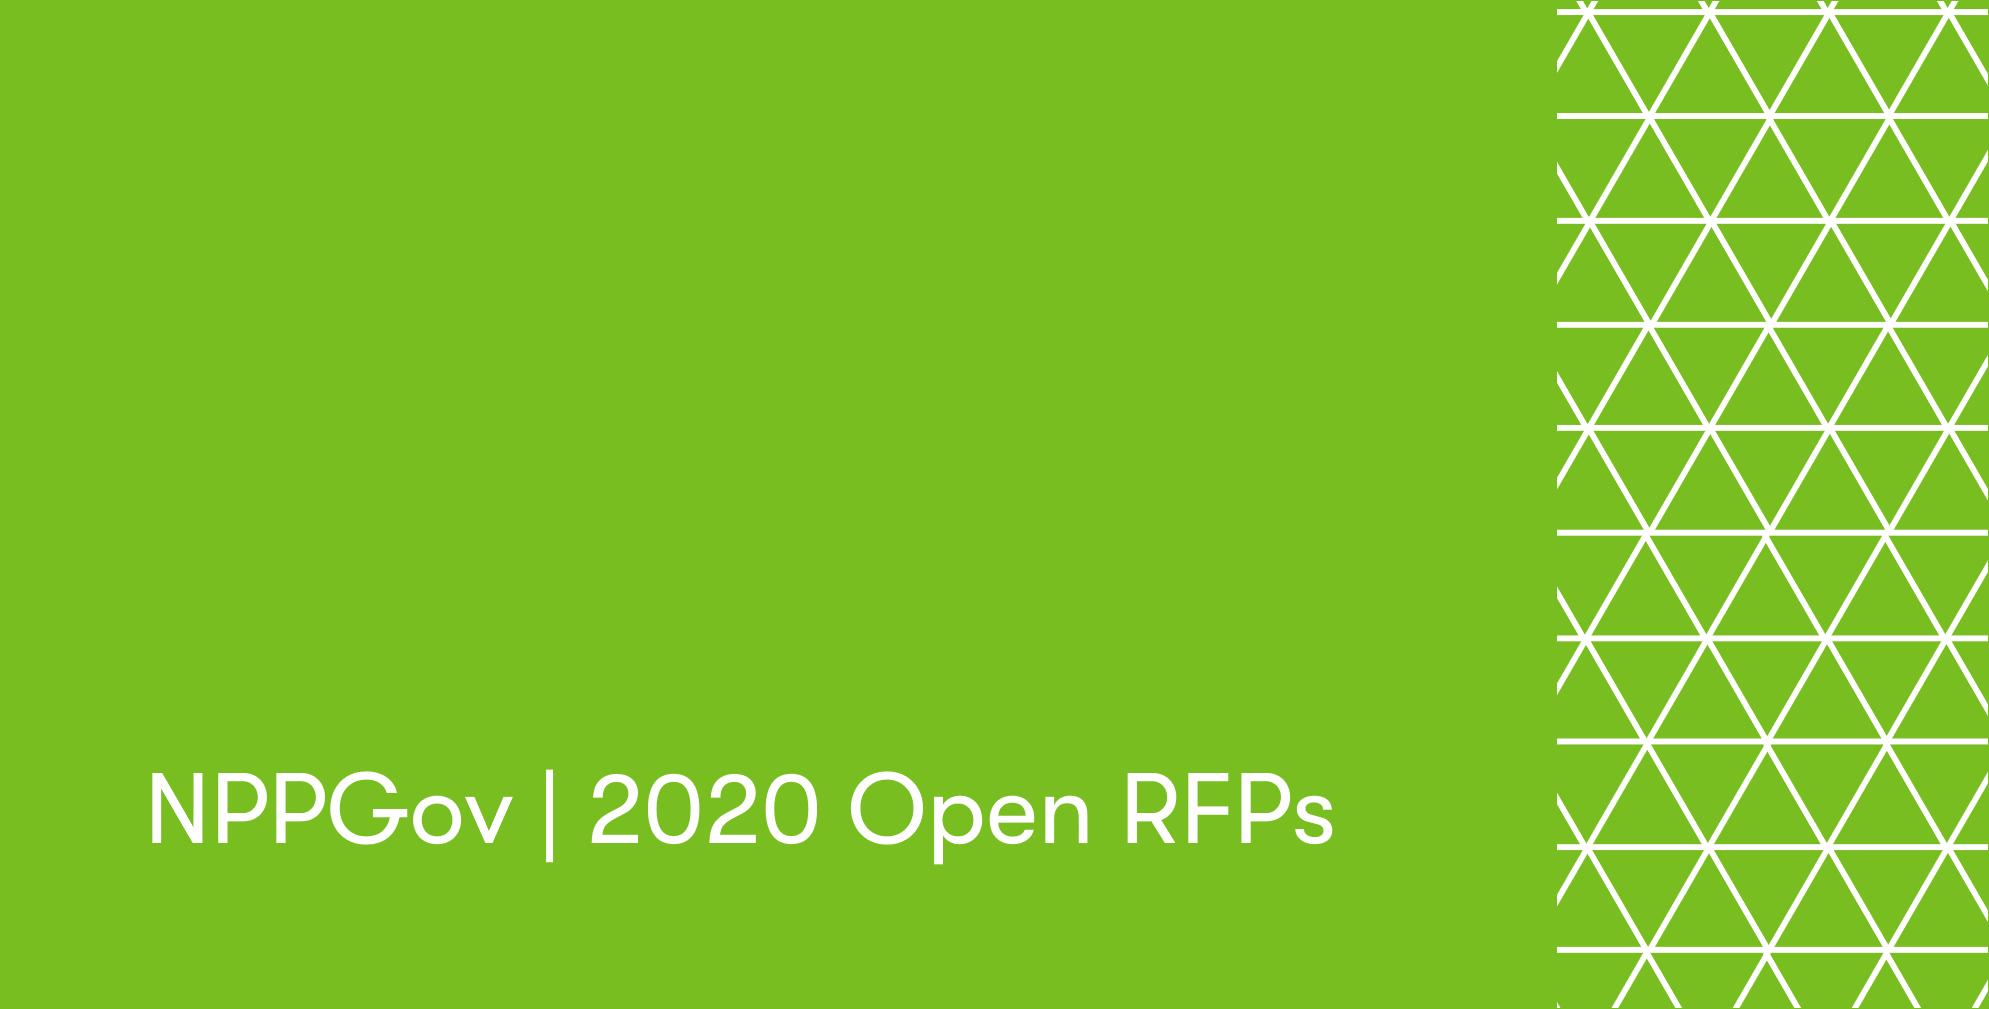 NPPGov 2020 RFP Announcement